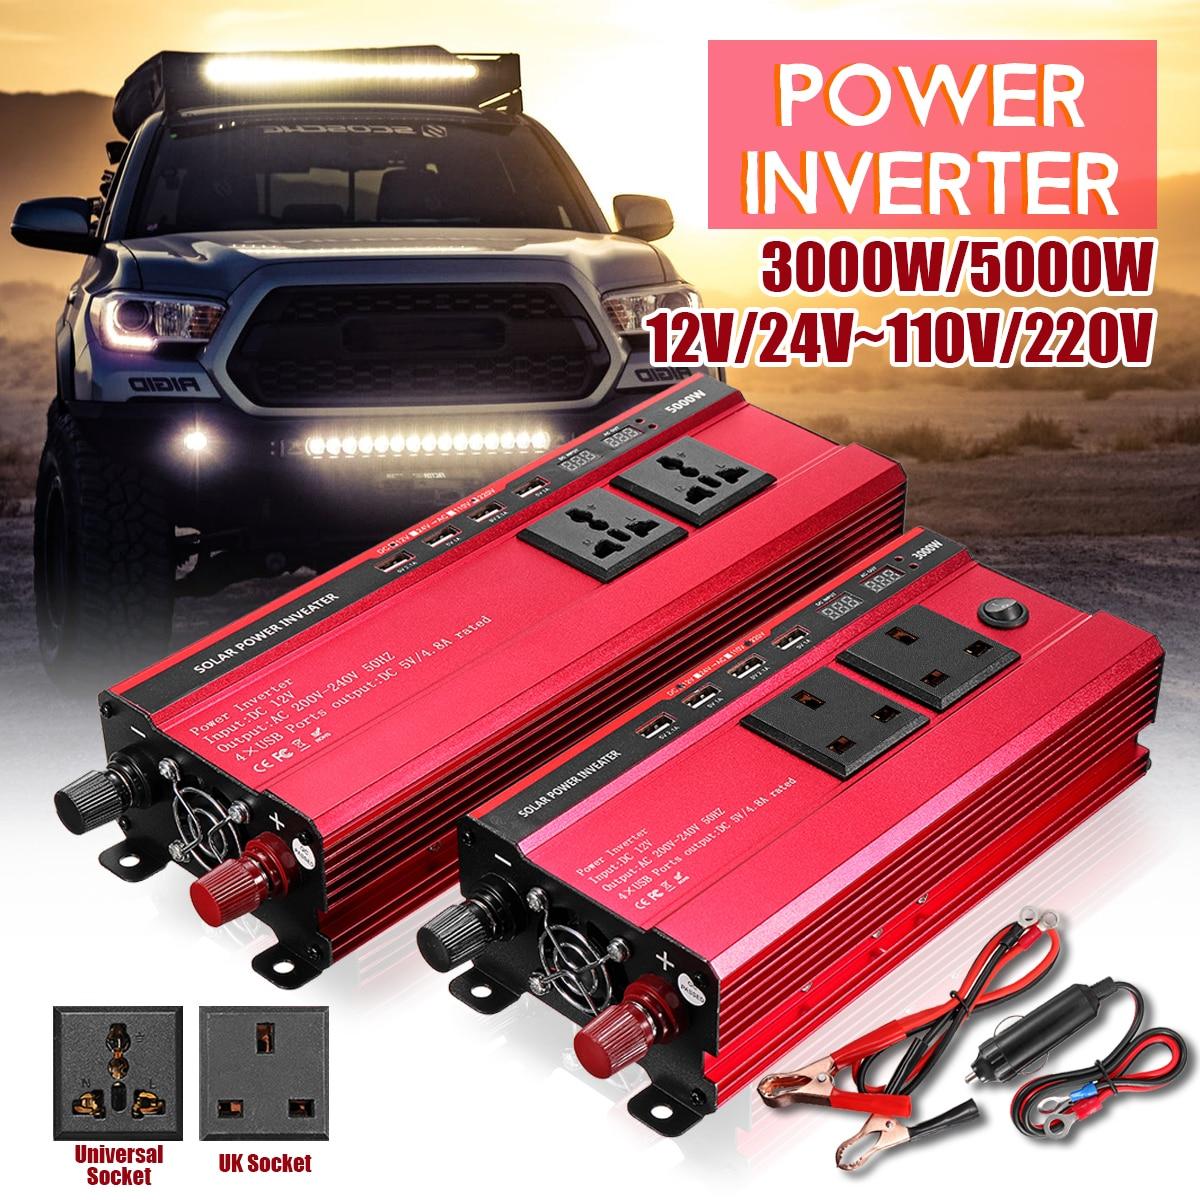 цена на Car Inverter 12V 220V 3000W/5000W P eak Power Voltage Transformer Converter DC 12V To AC 220V Modified Sine Wave Solar Inverter